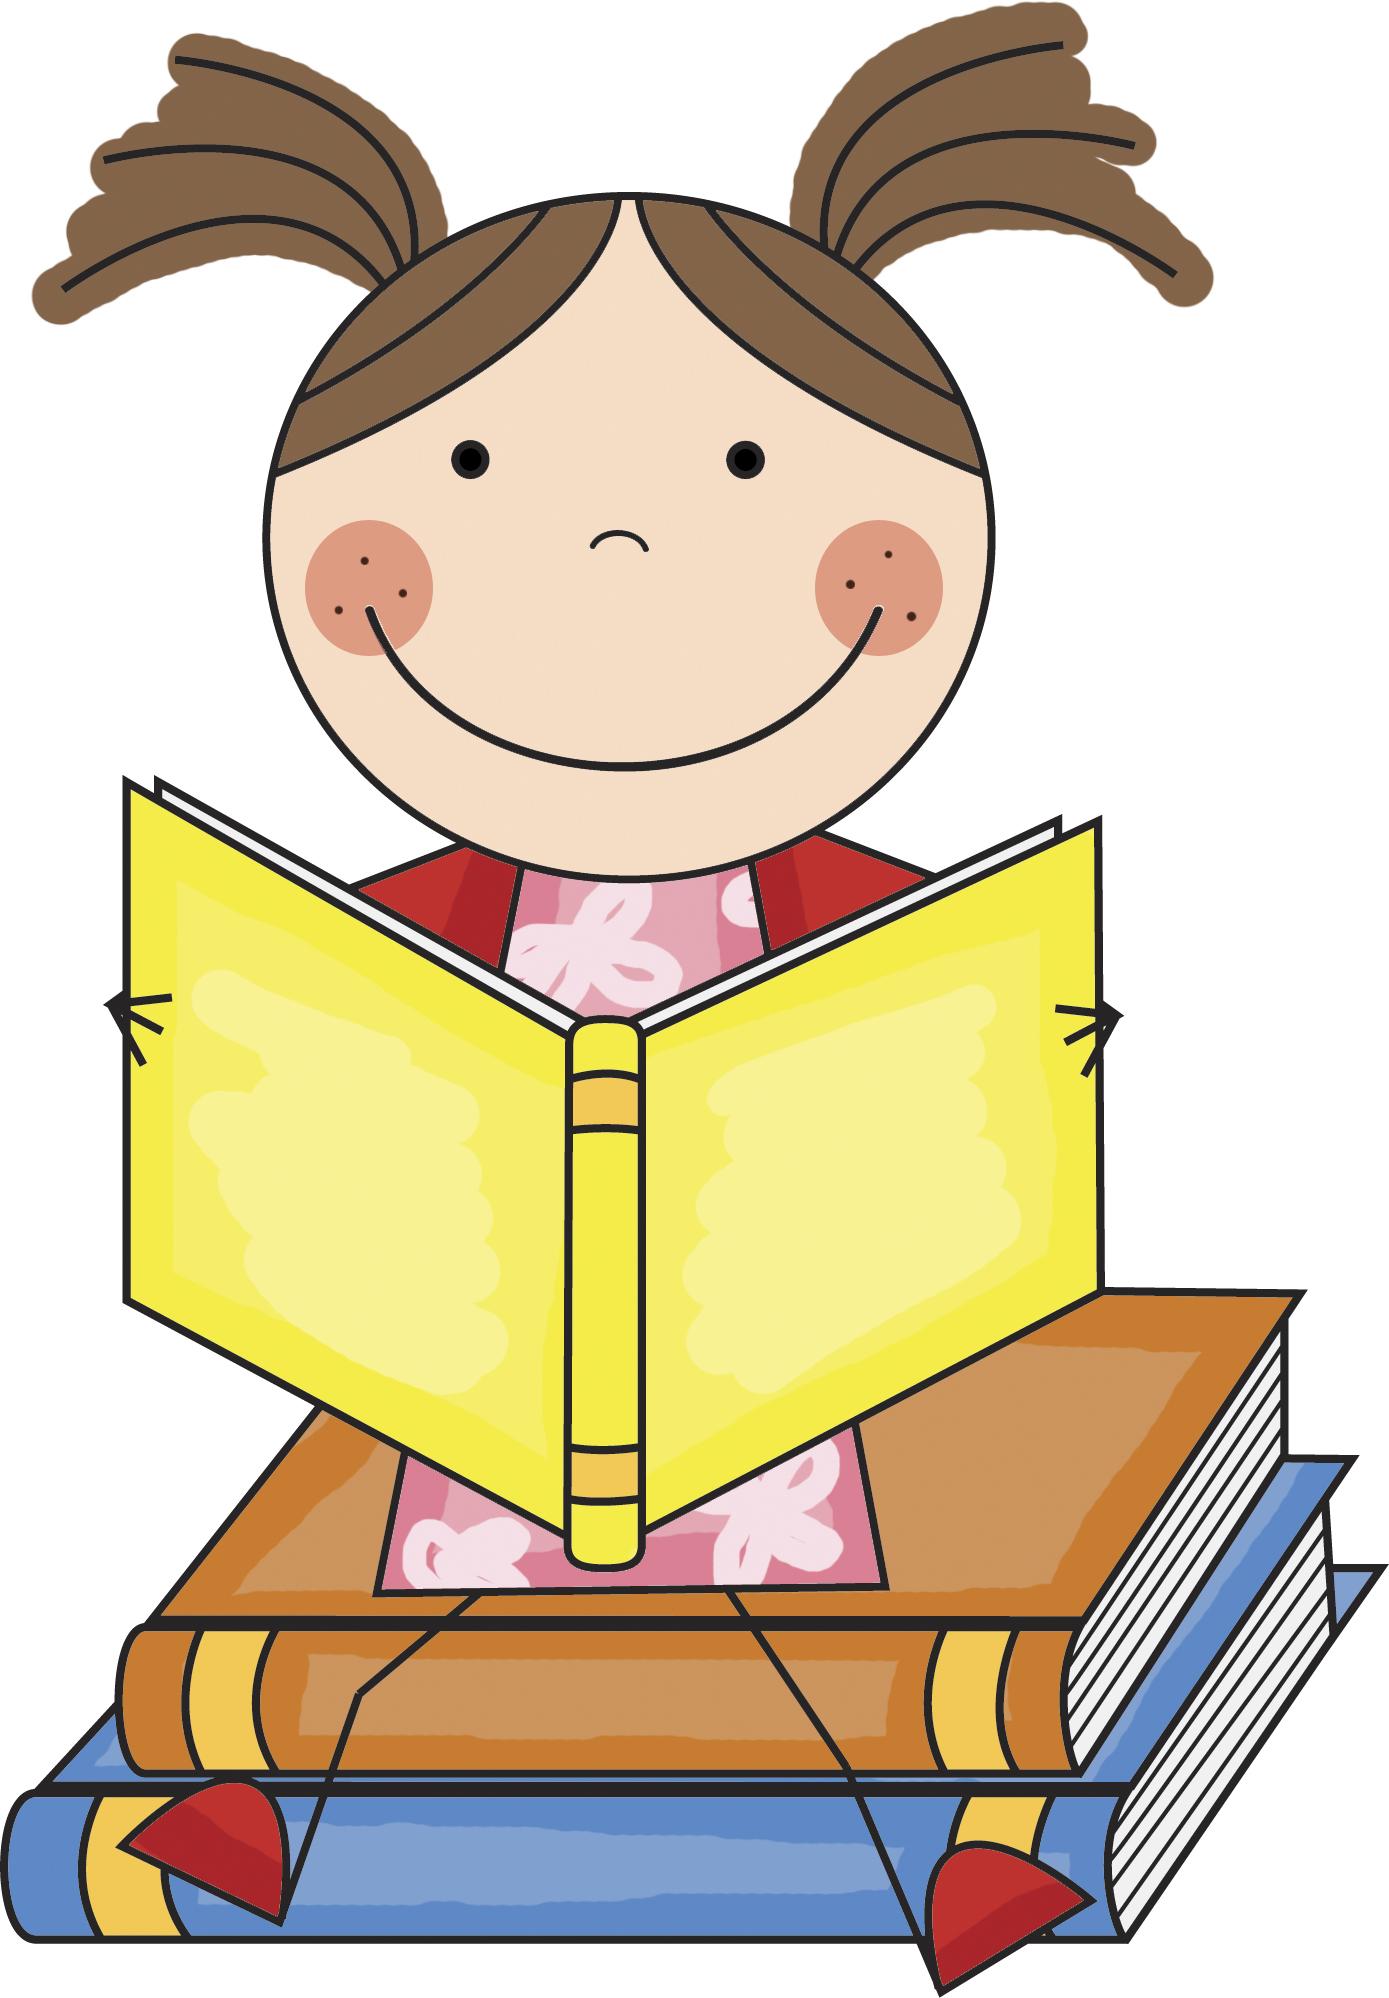 Boy girl reading clipart jpg freeuse library Boy and girl reading clipart clipart kid - Cliparting.com jpg freeuse library